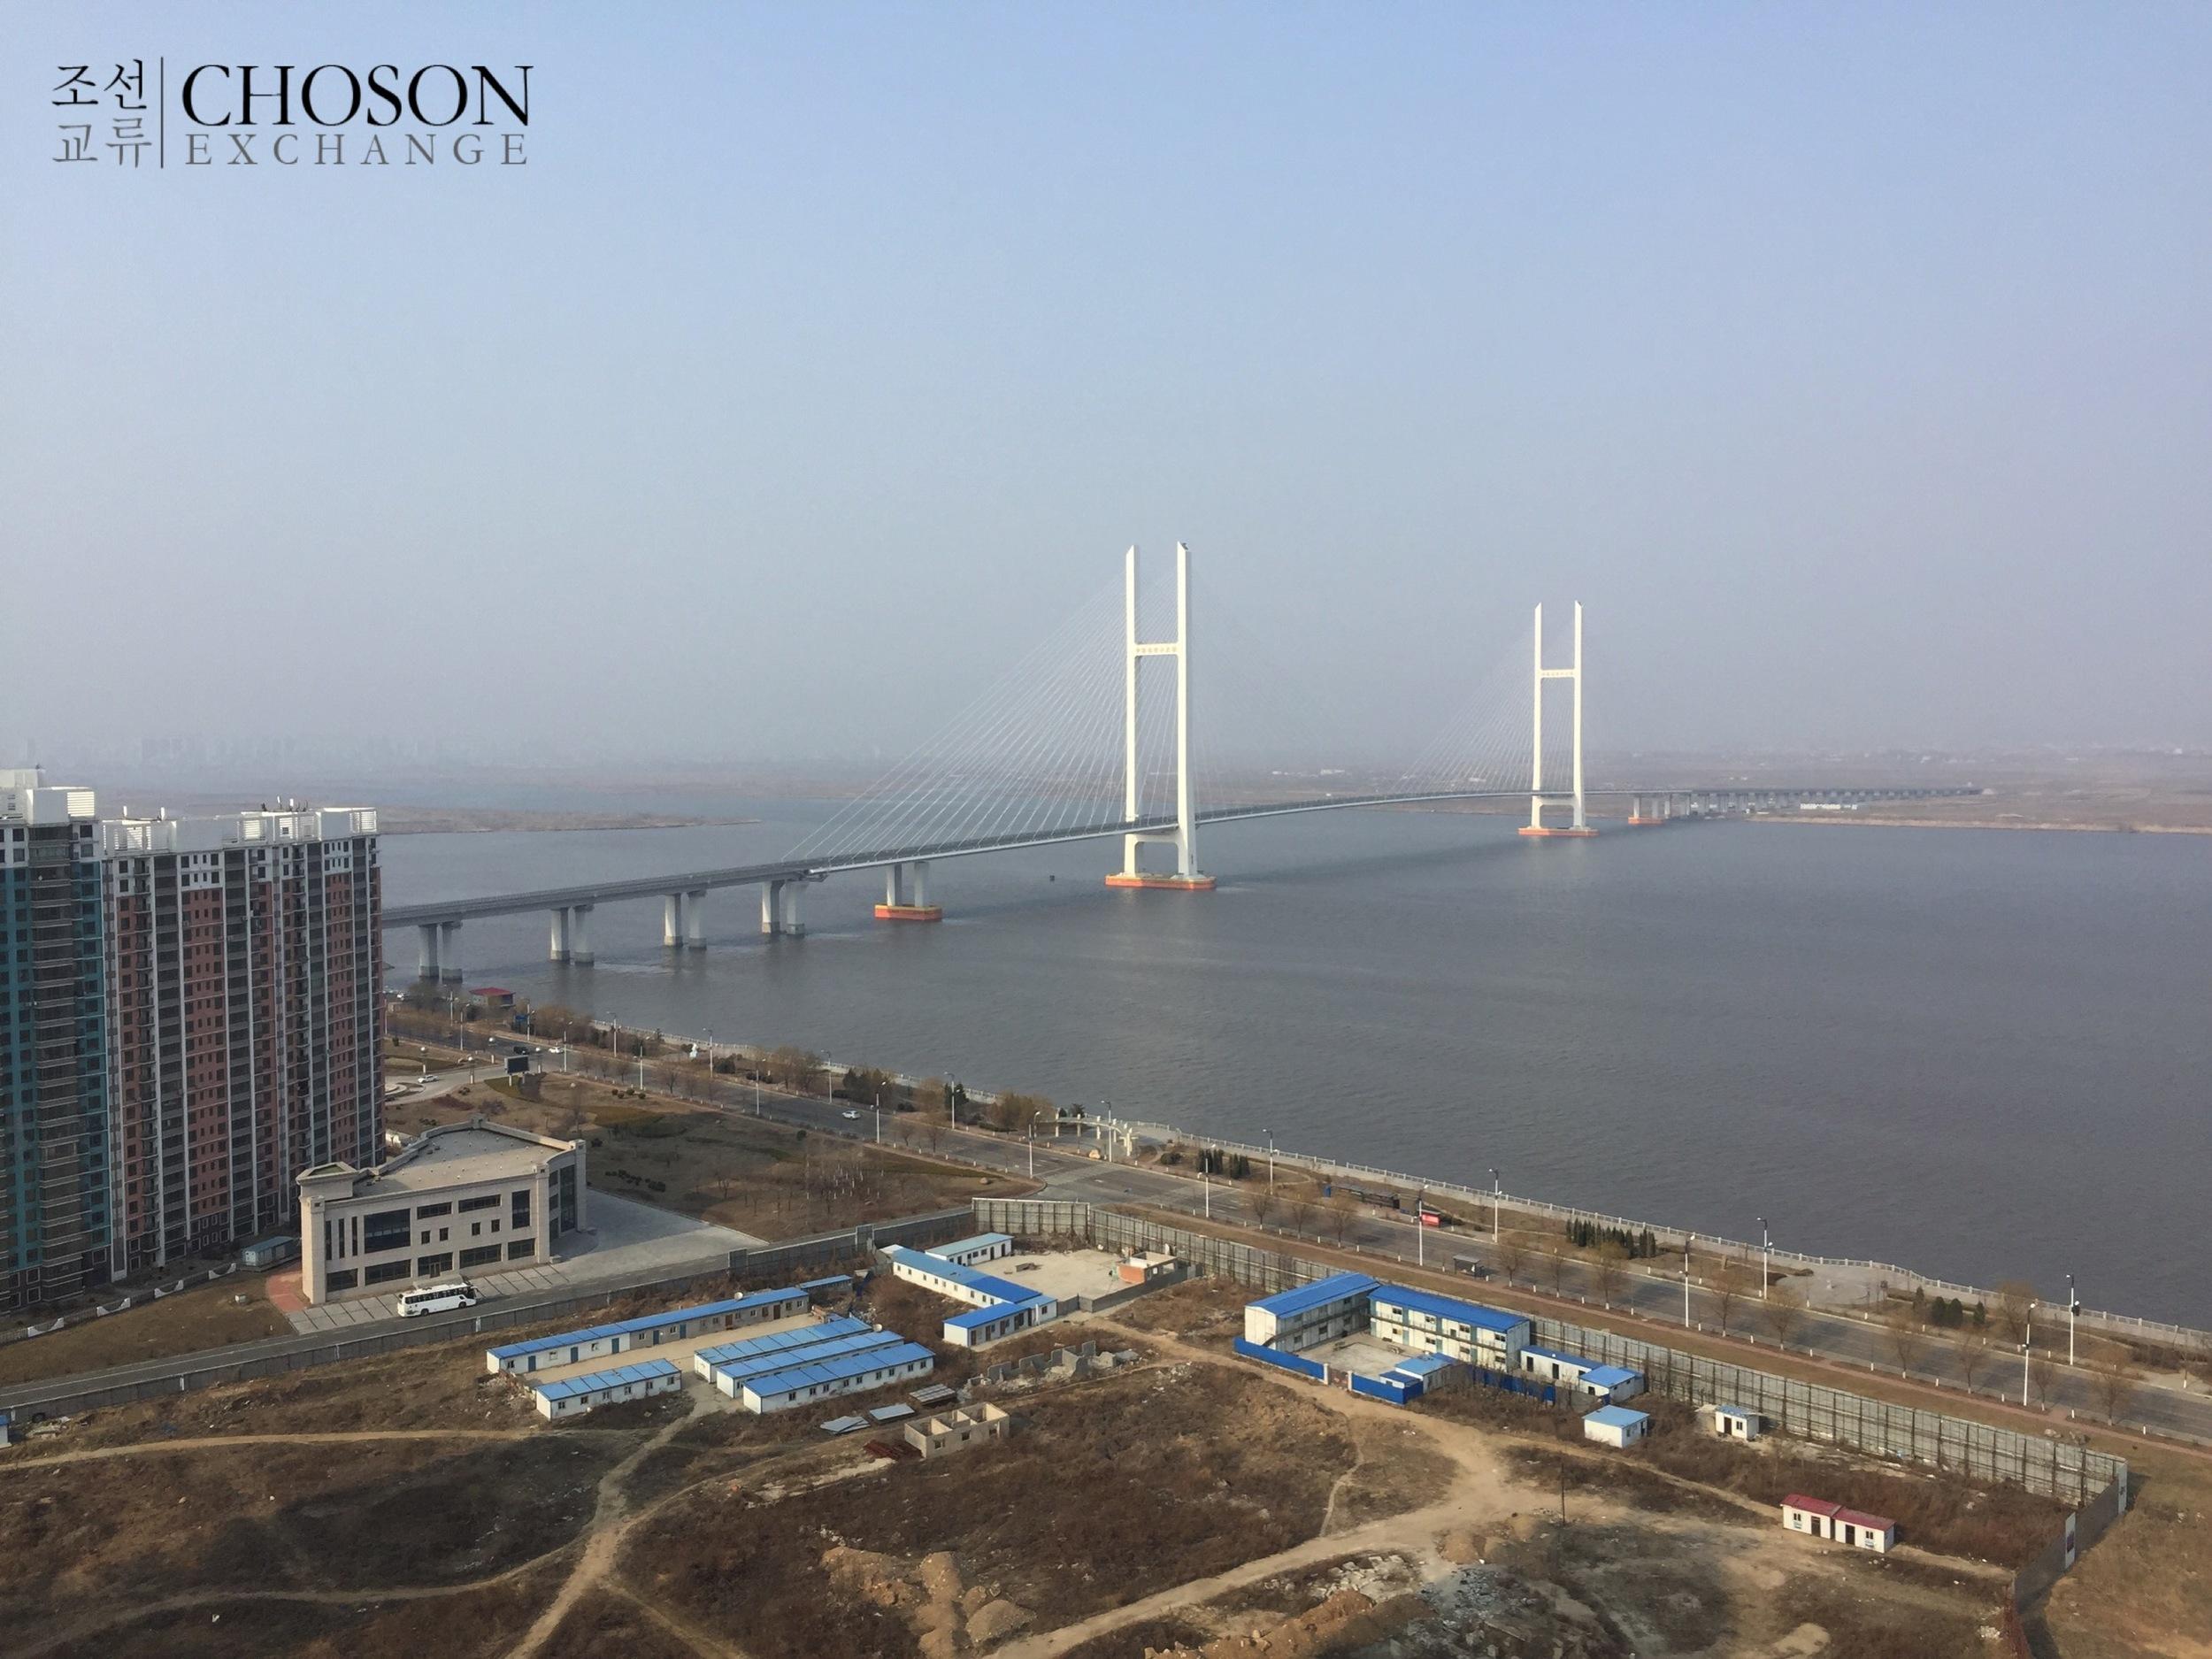 View from Singapore City of the Sino-DPRK Friendship Bridge